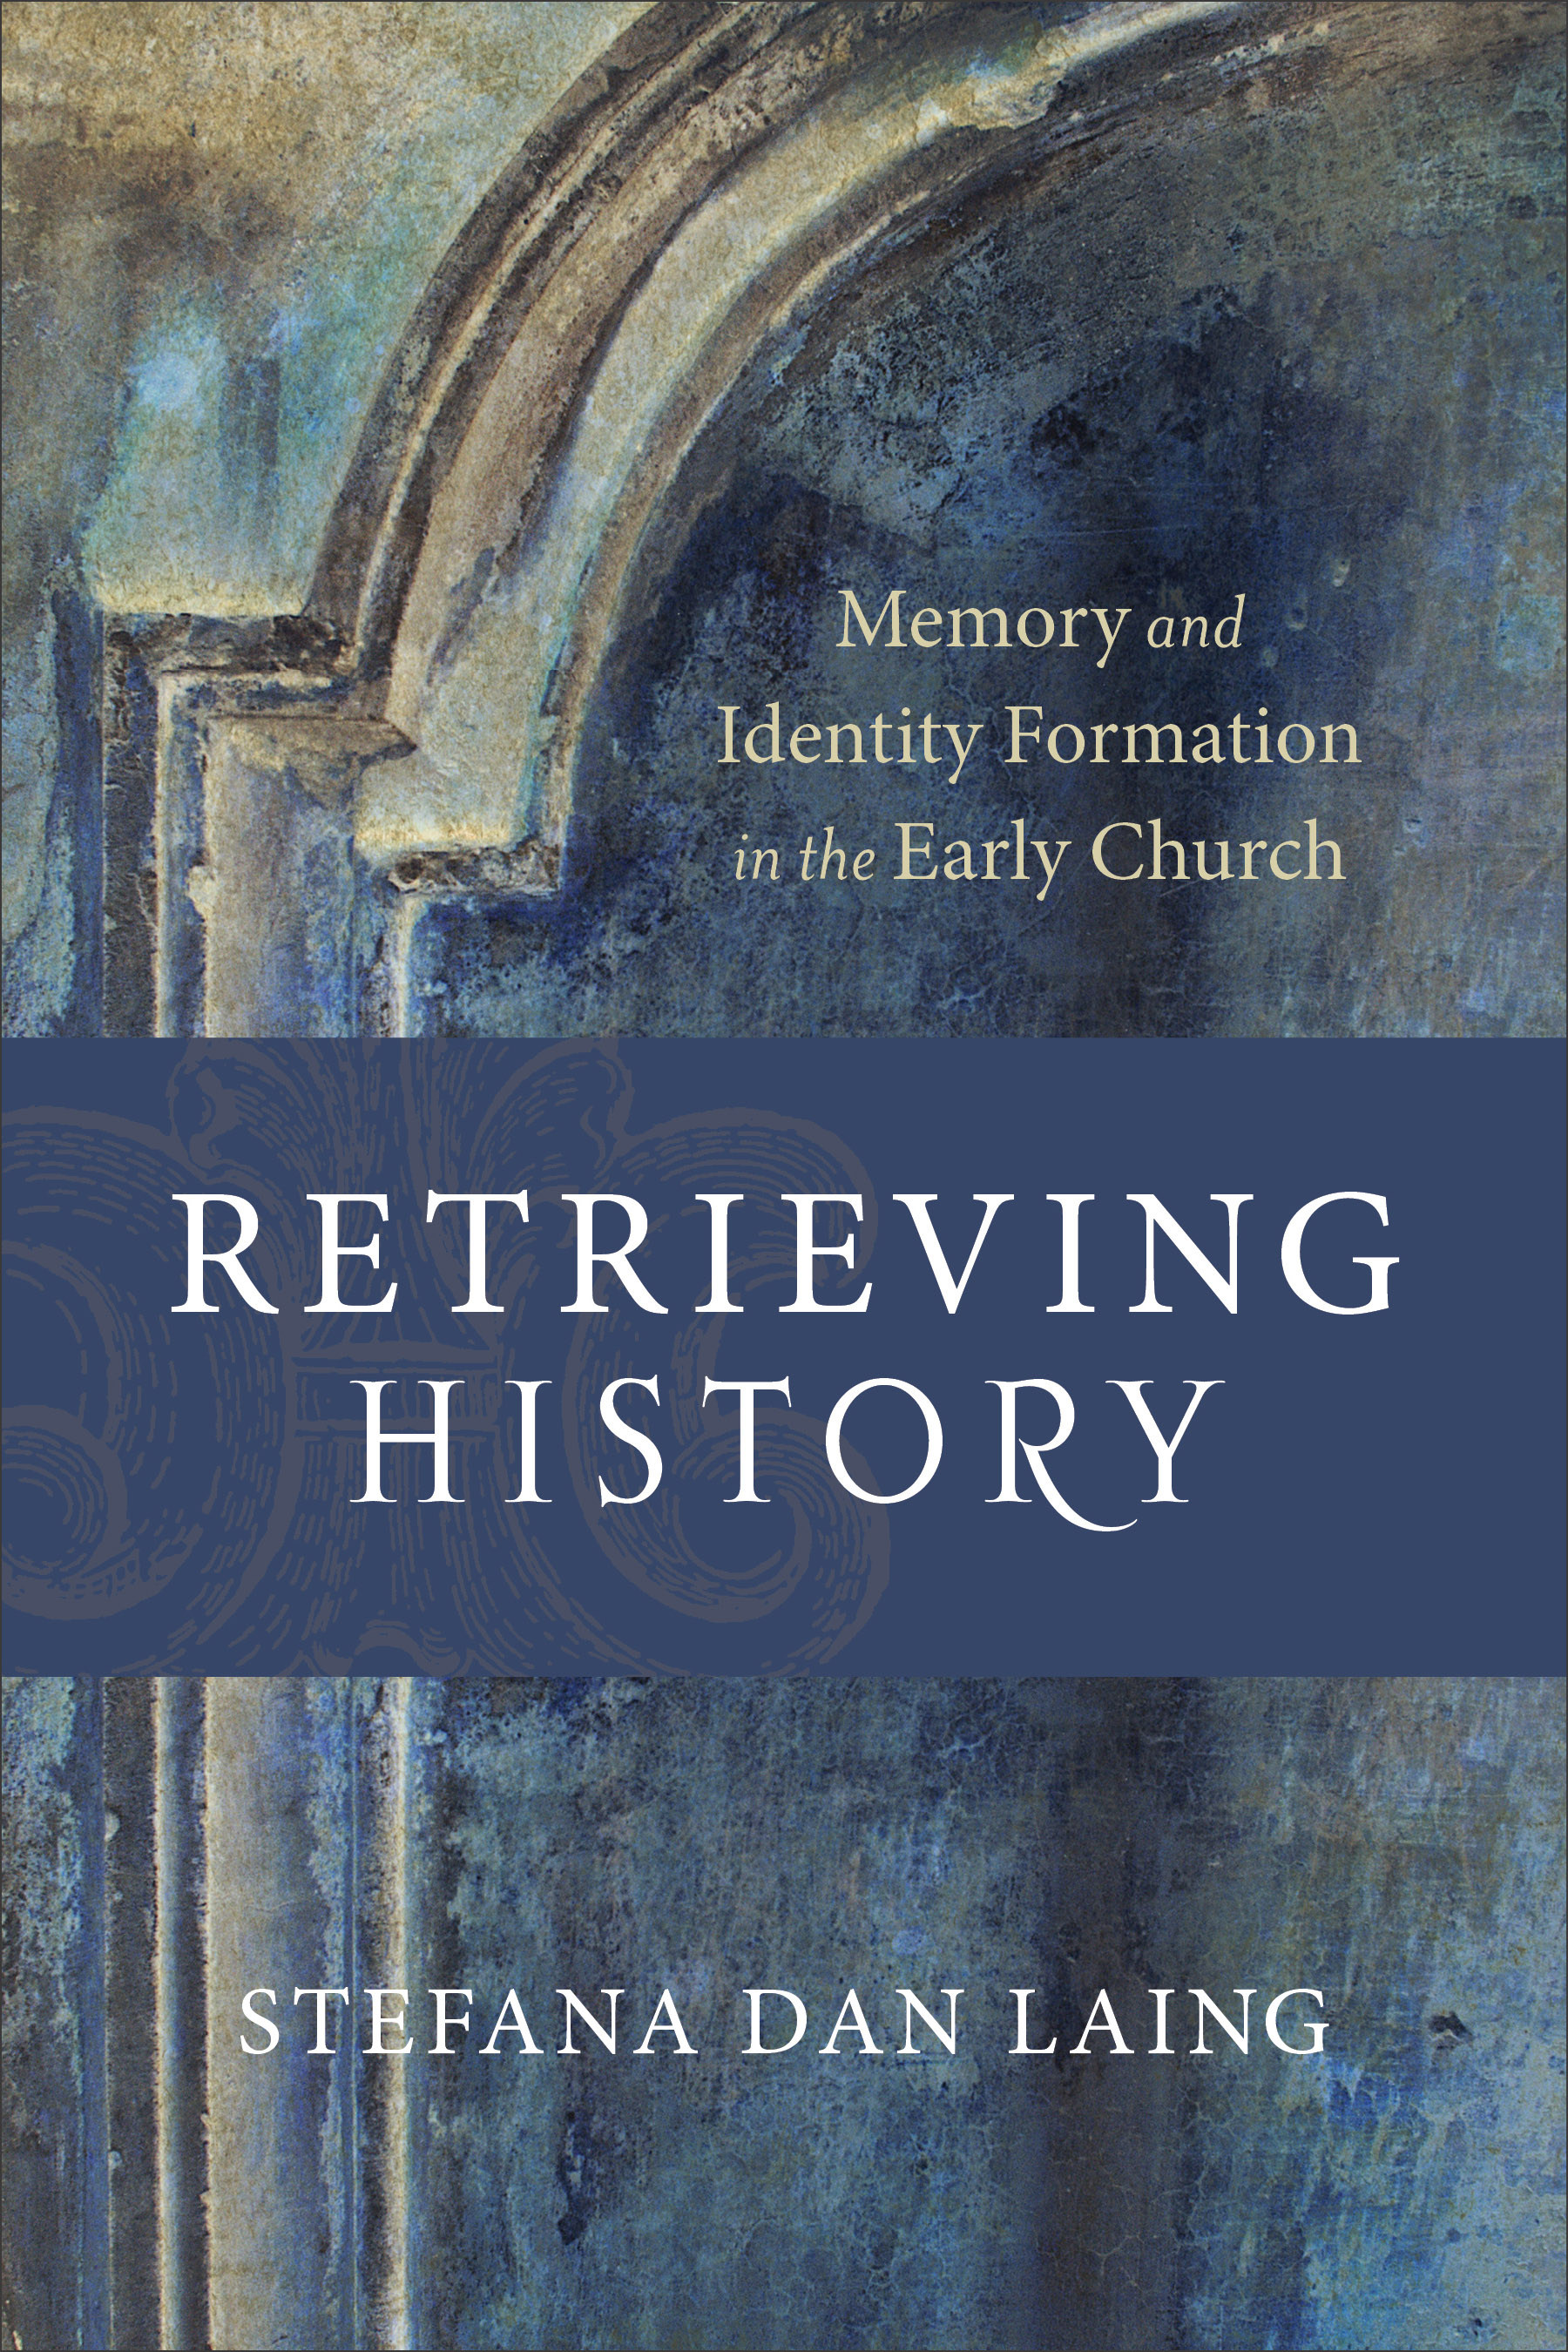 Laing Retrieving History